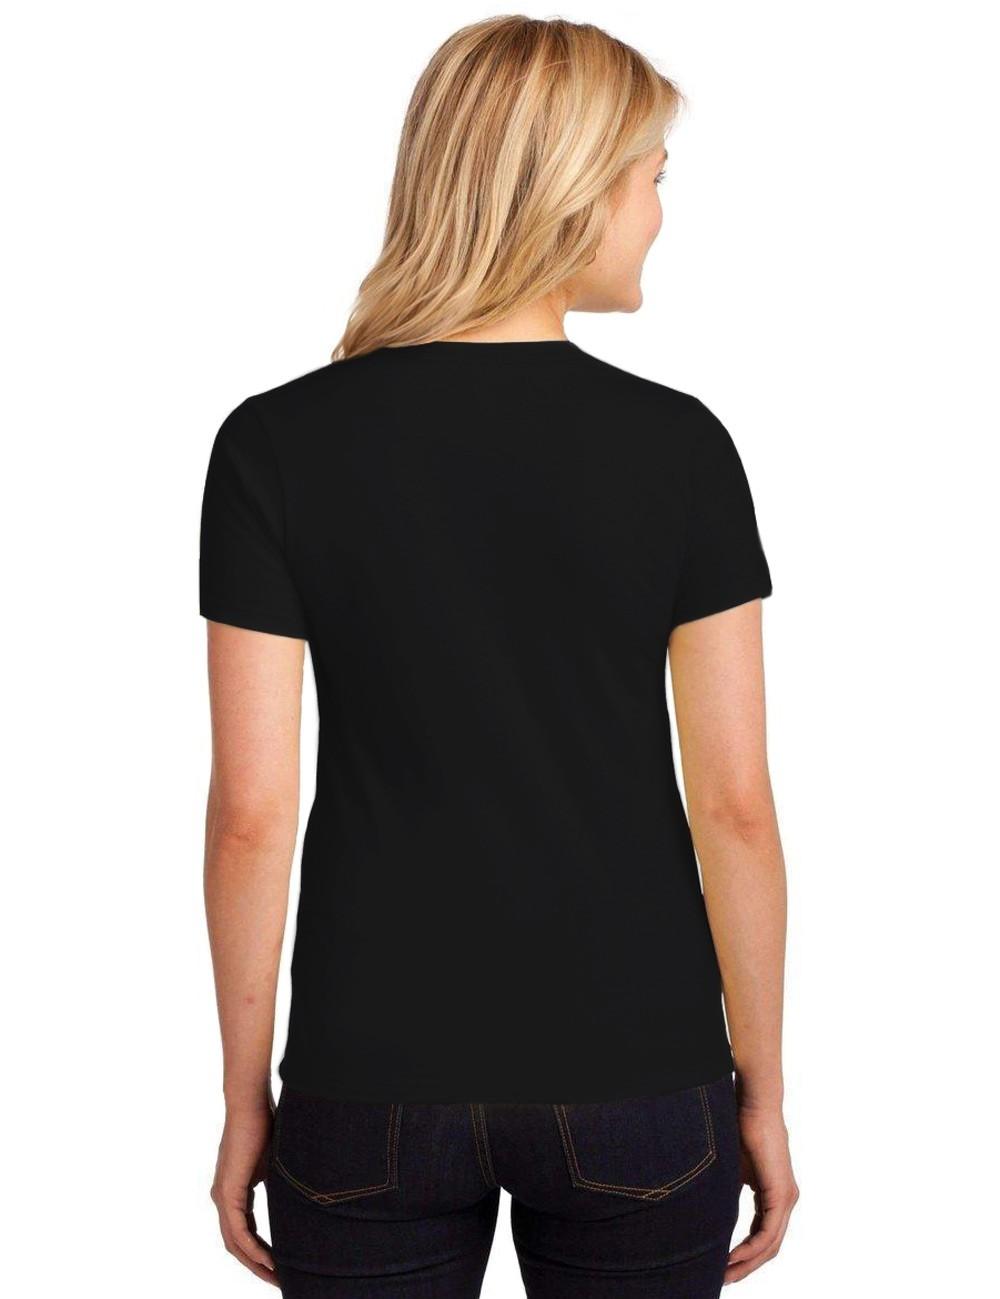 Camiseta Feminina T-Shirt Universitária Faculdade Enfermagem